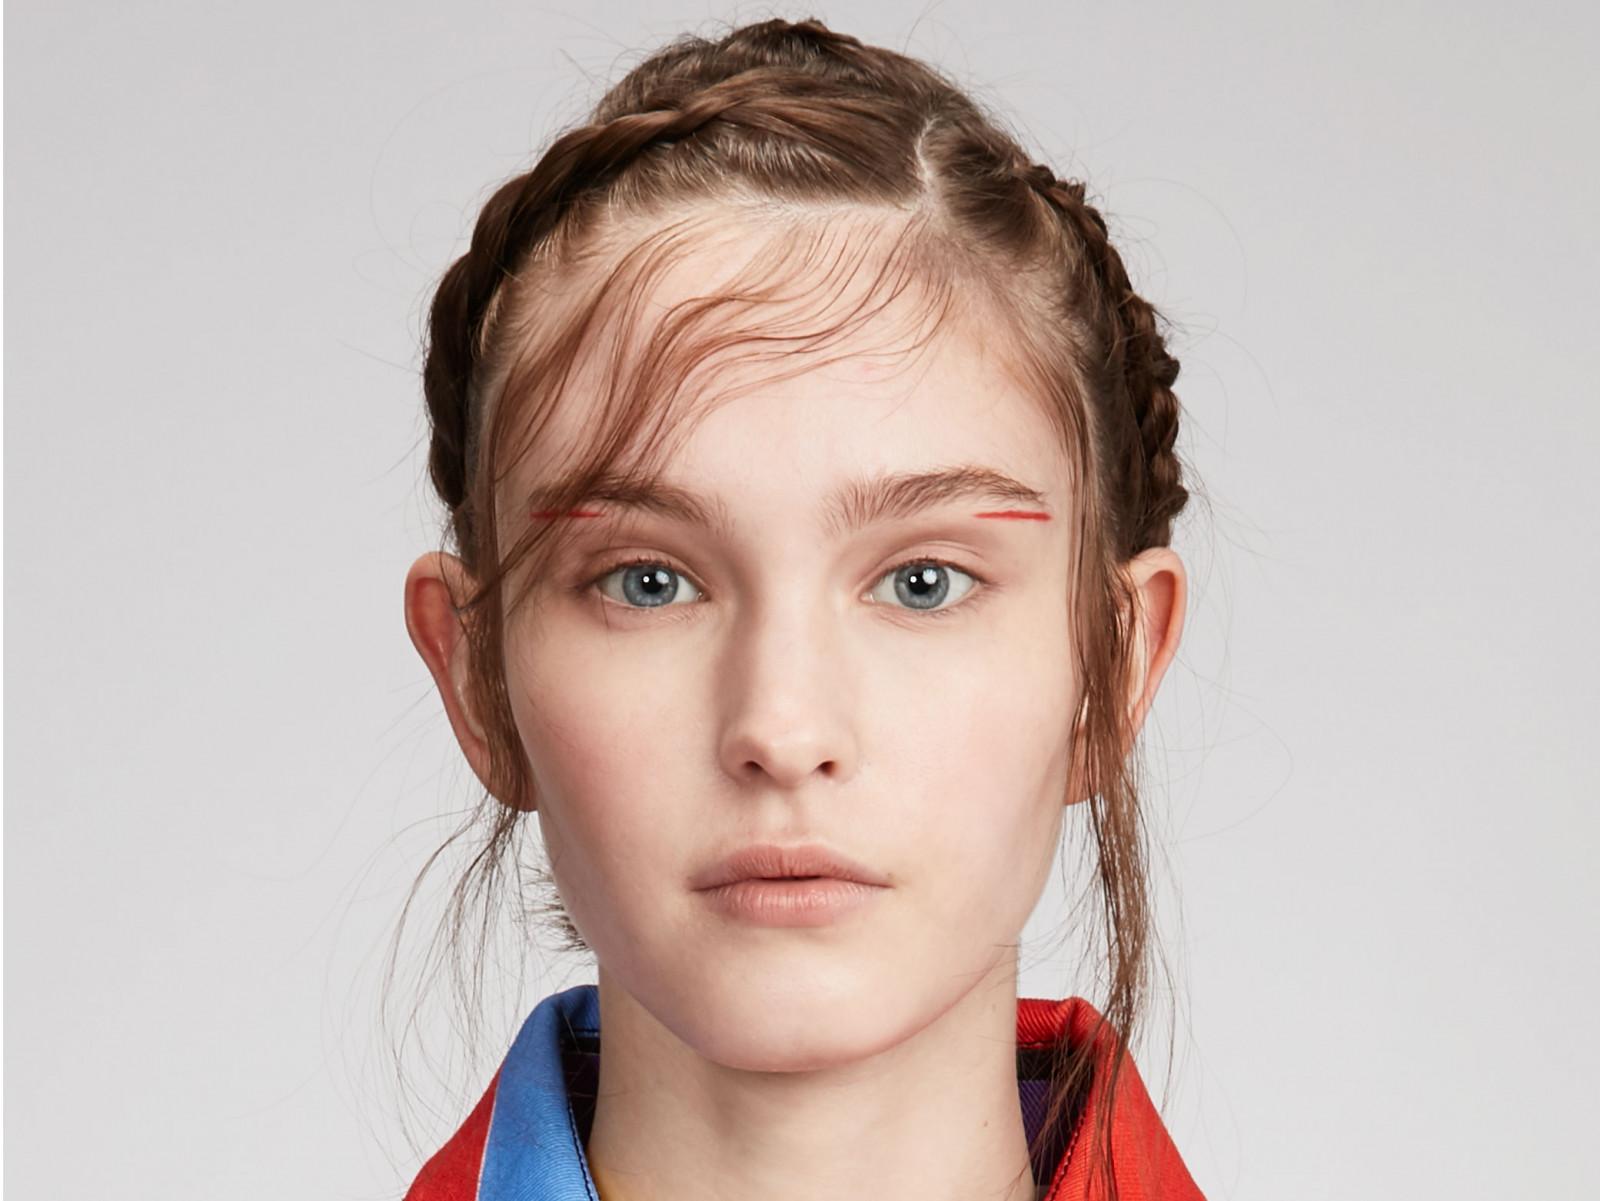 Baby hair: hairstyle di tendenza per acconciature minimal e chic!